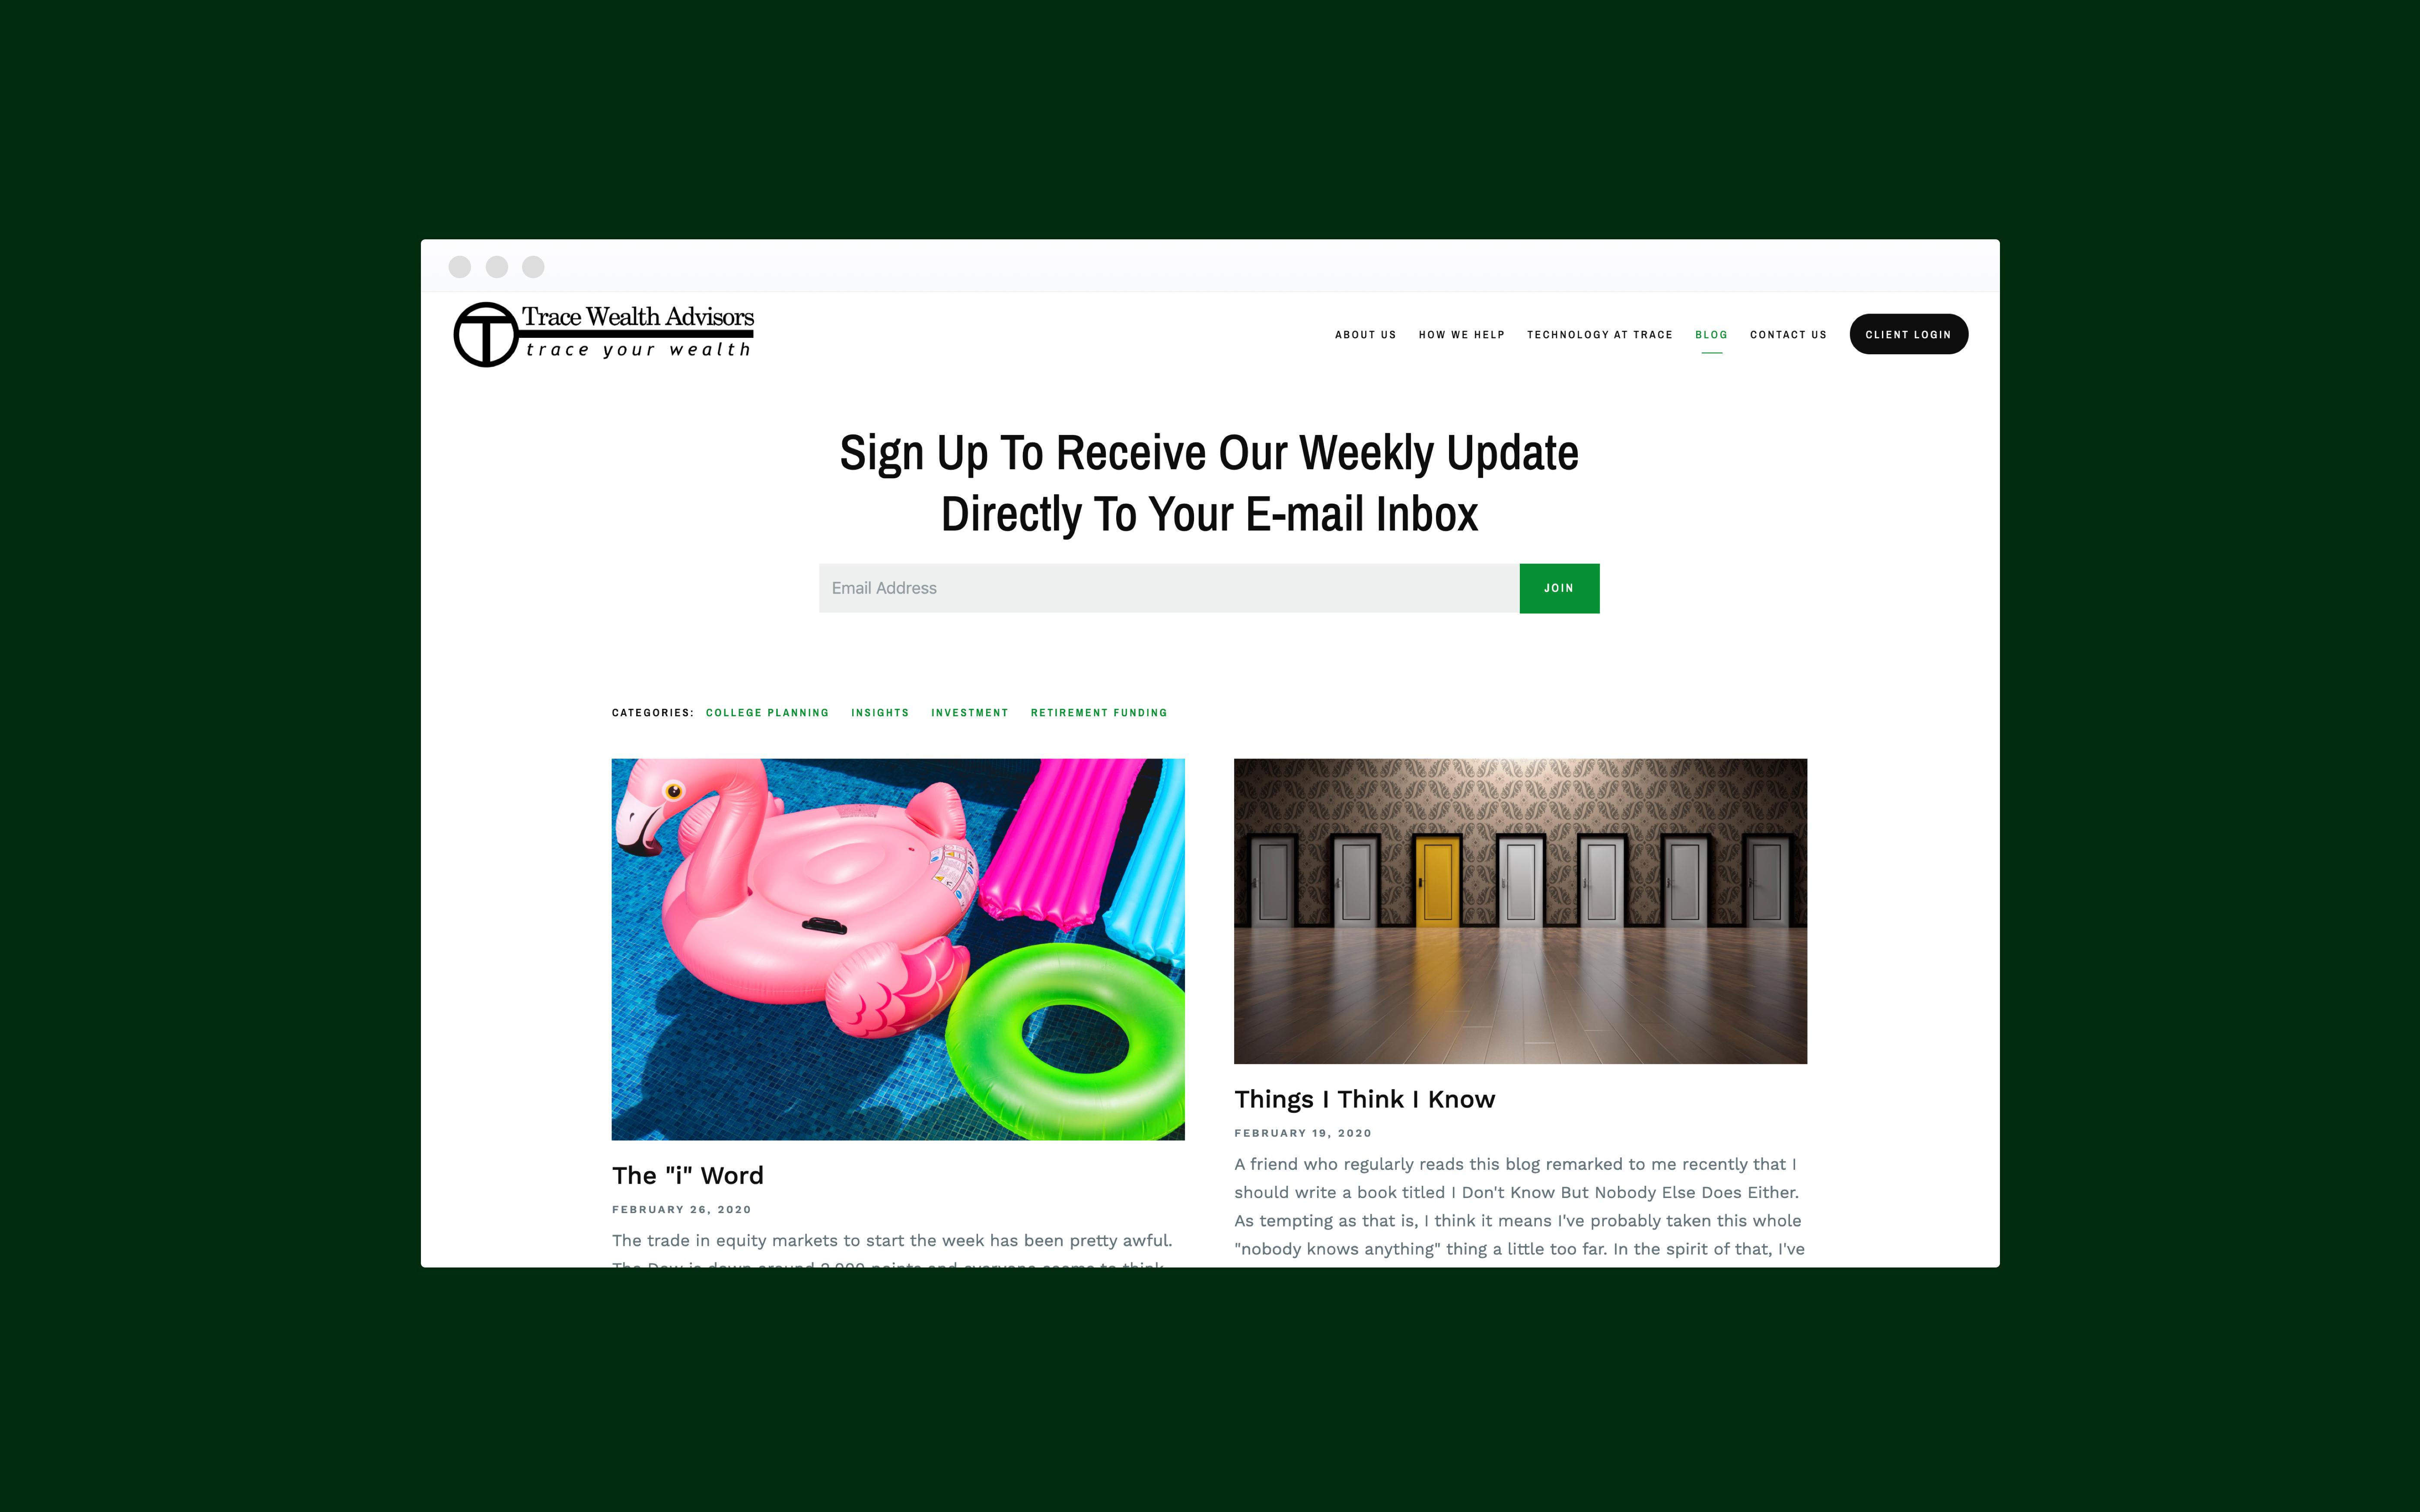 Trace Wealth Advisors blog